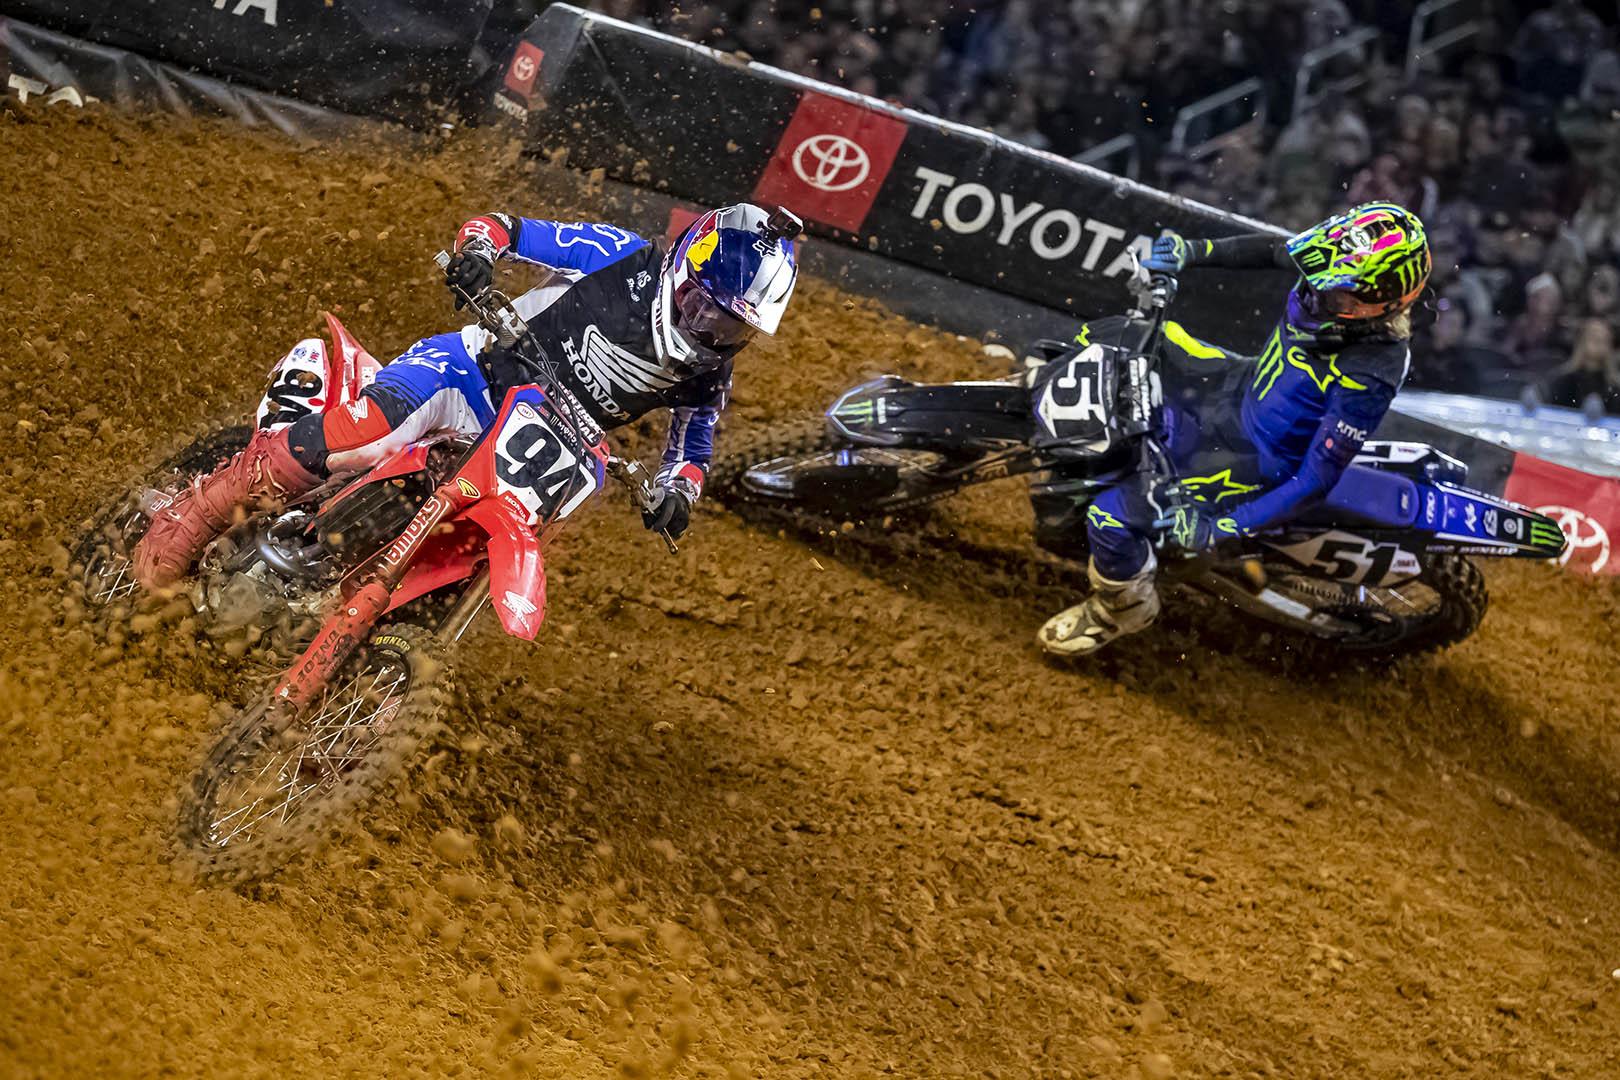 2020 Atlanta Fantasy Supercross Picks: Tomac, Roczen, Barcia, and more